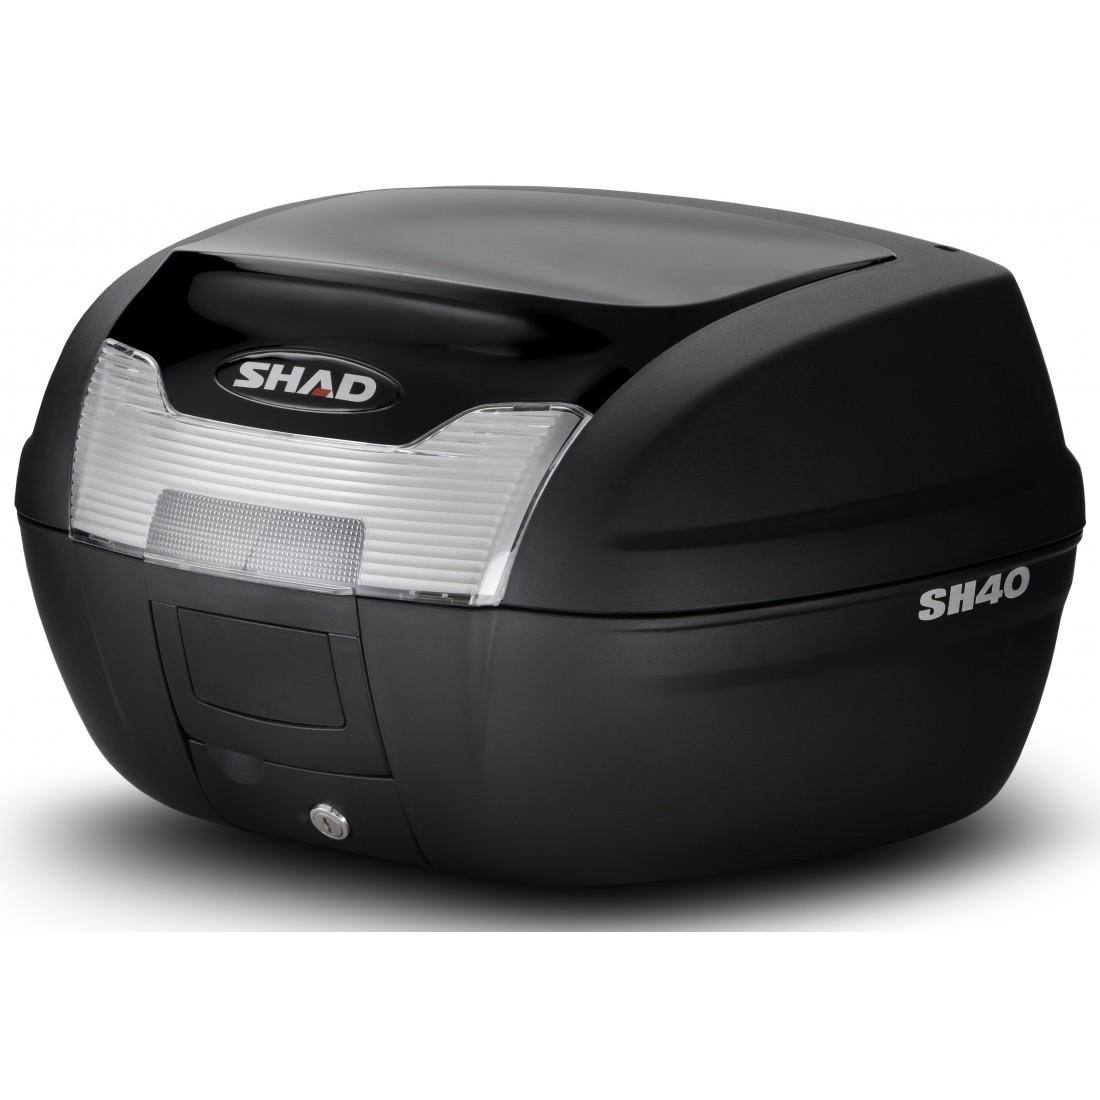 Tapa Baúl Shad SH40 40lt Negro Metal